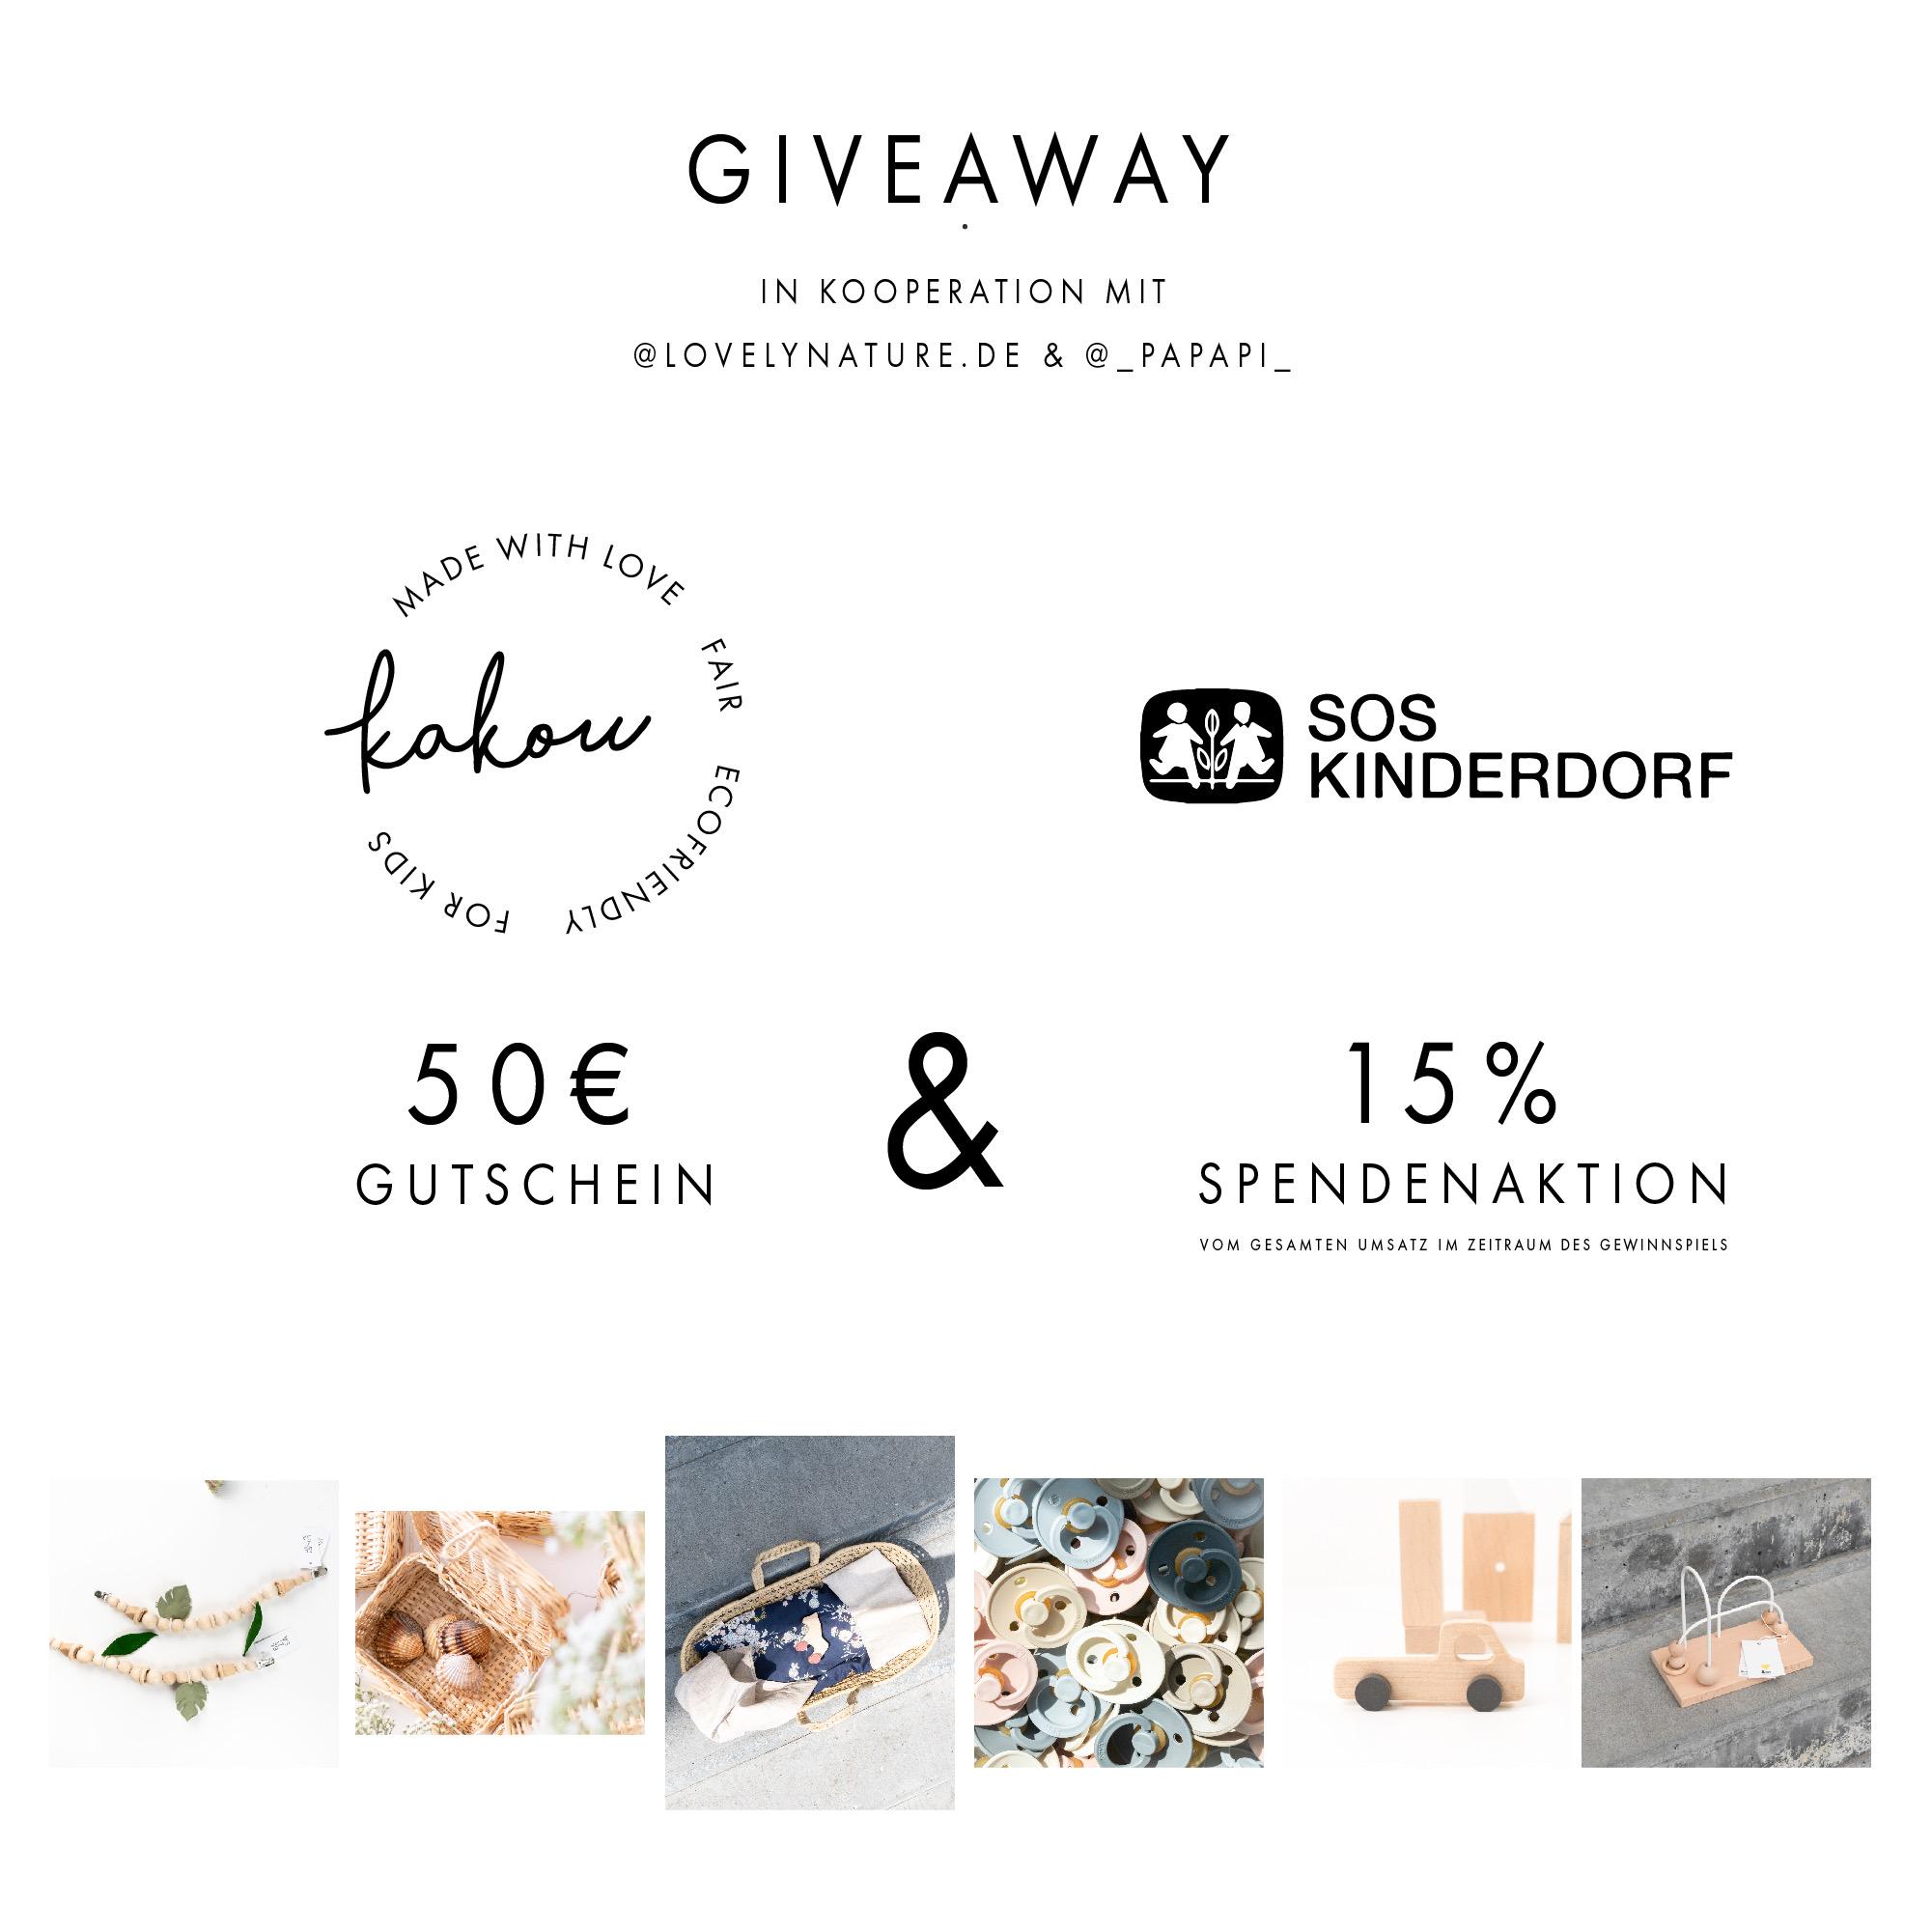 Giveaway_kakoushop.de_final-16.jpeg